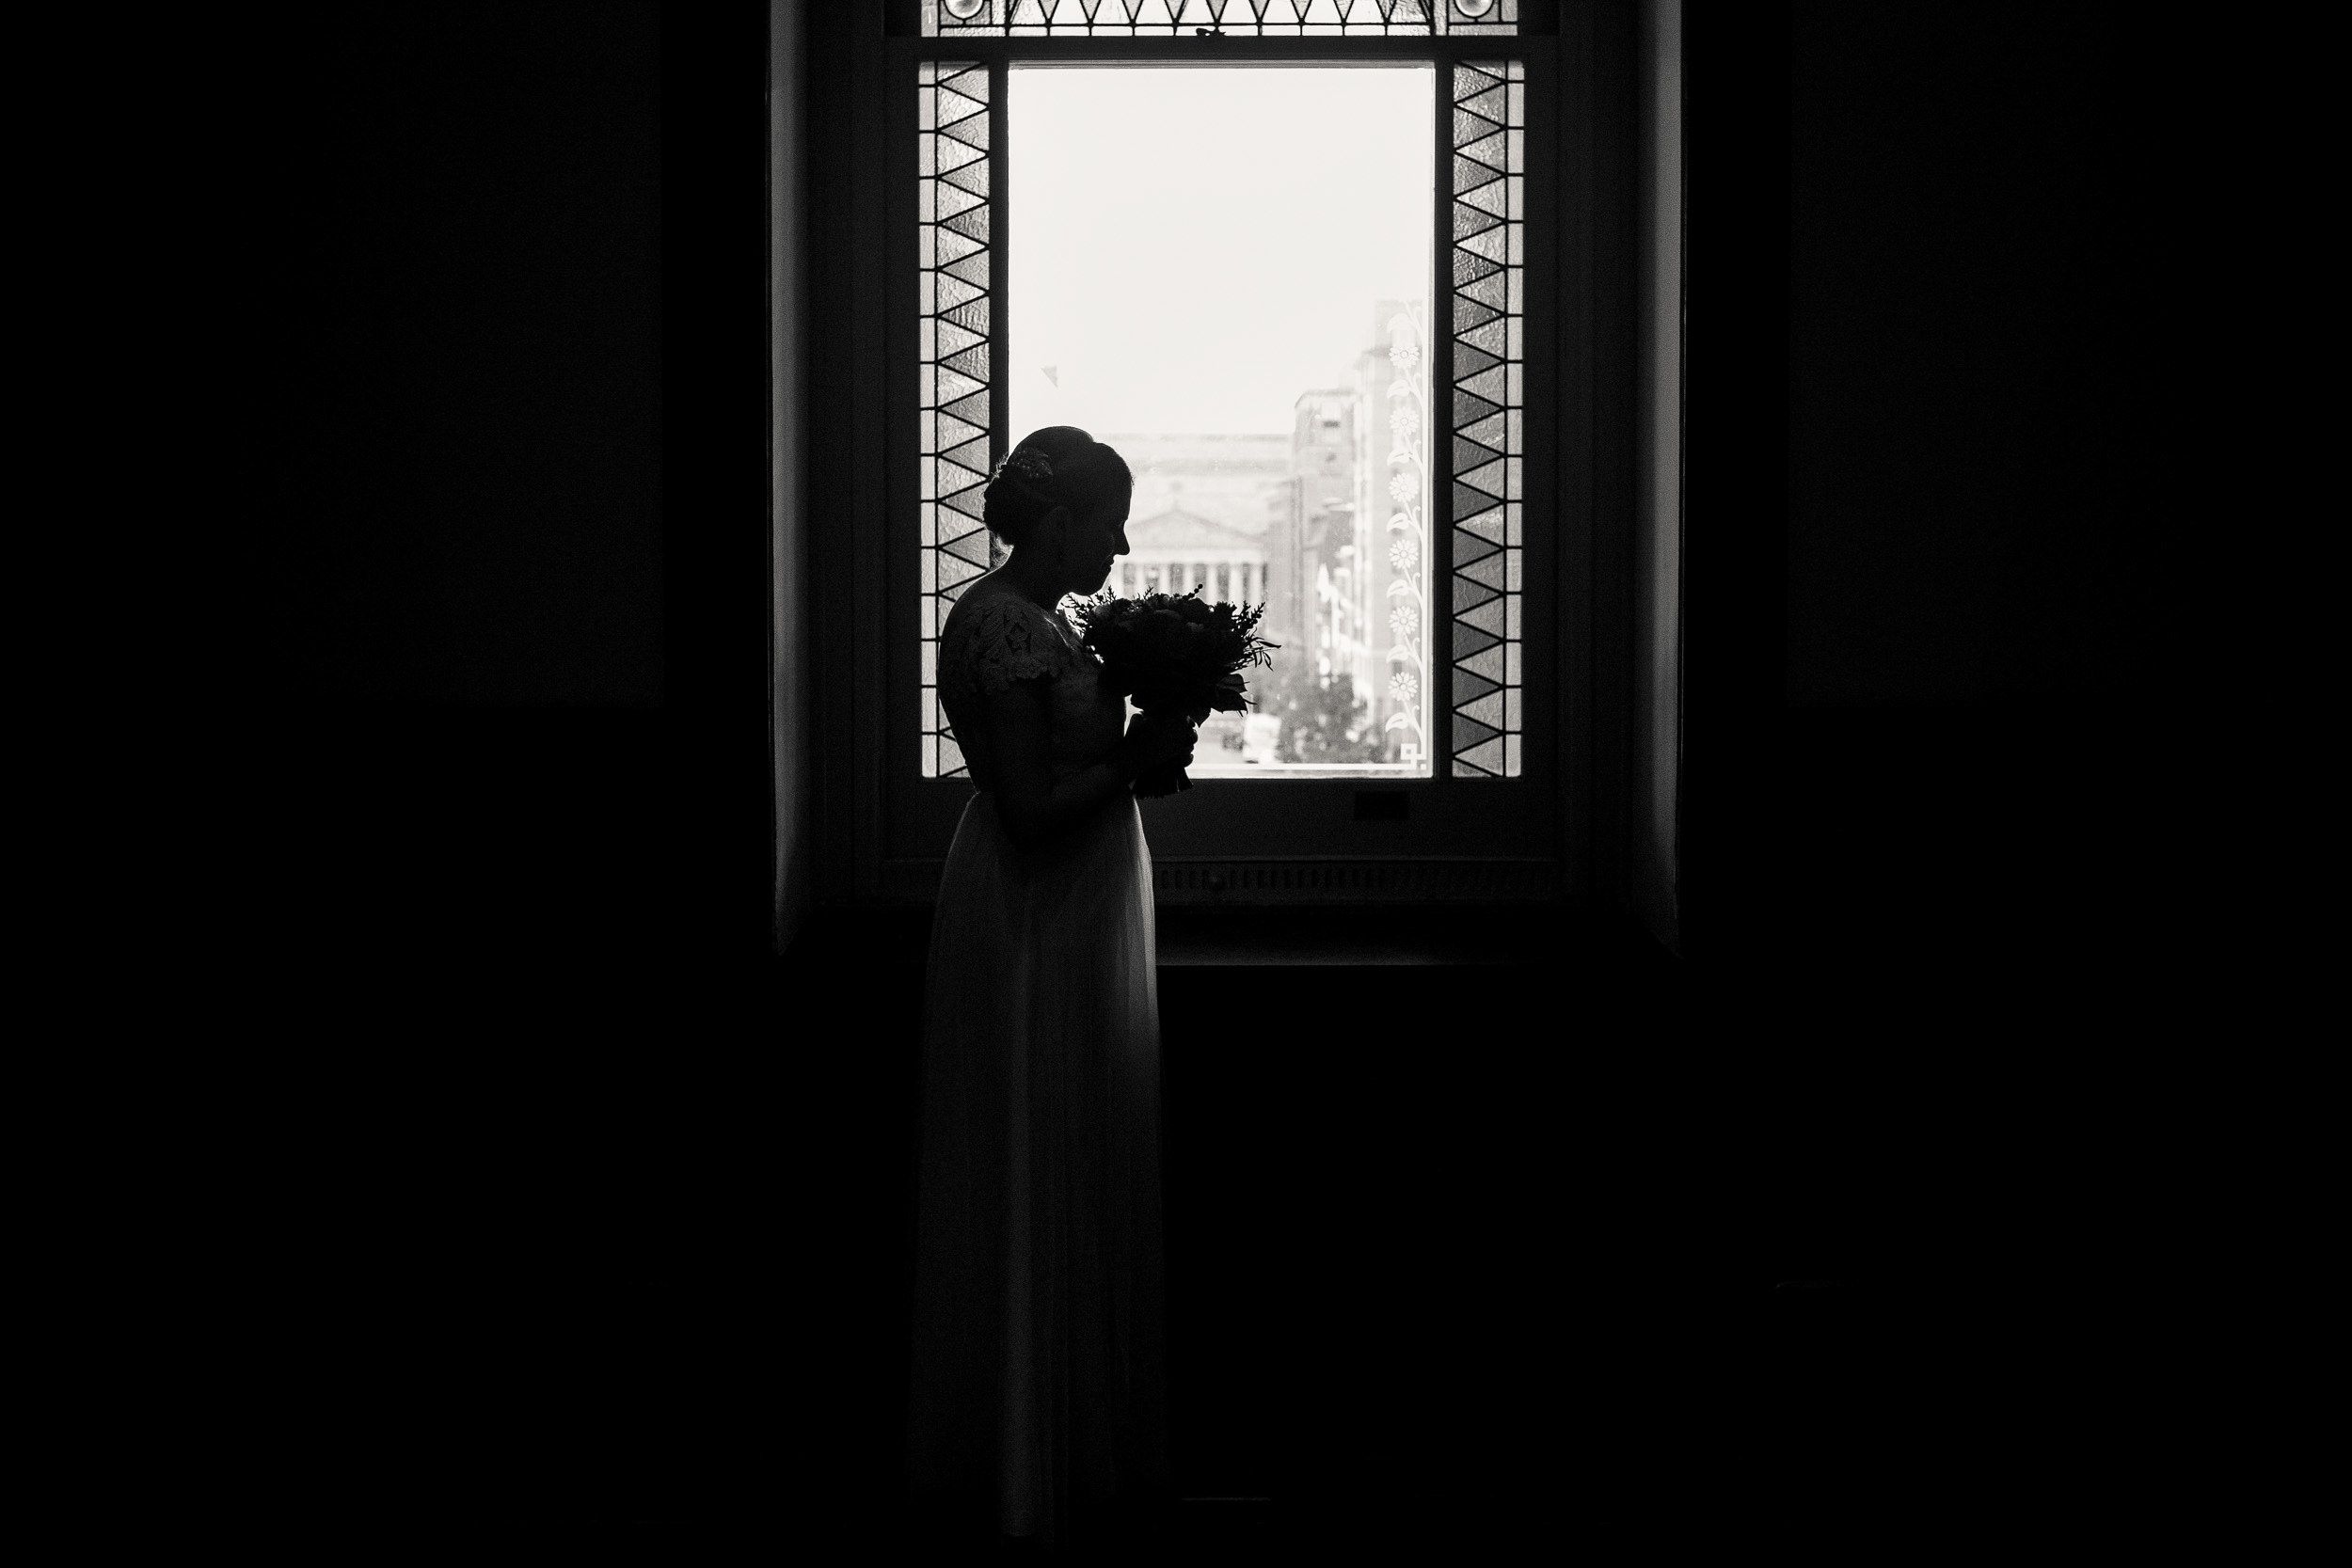 bride-silhouette.jpg